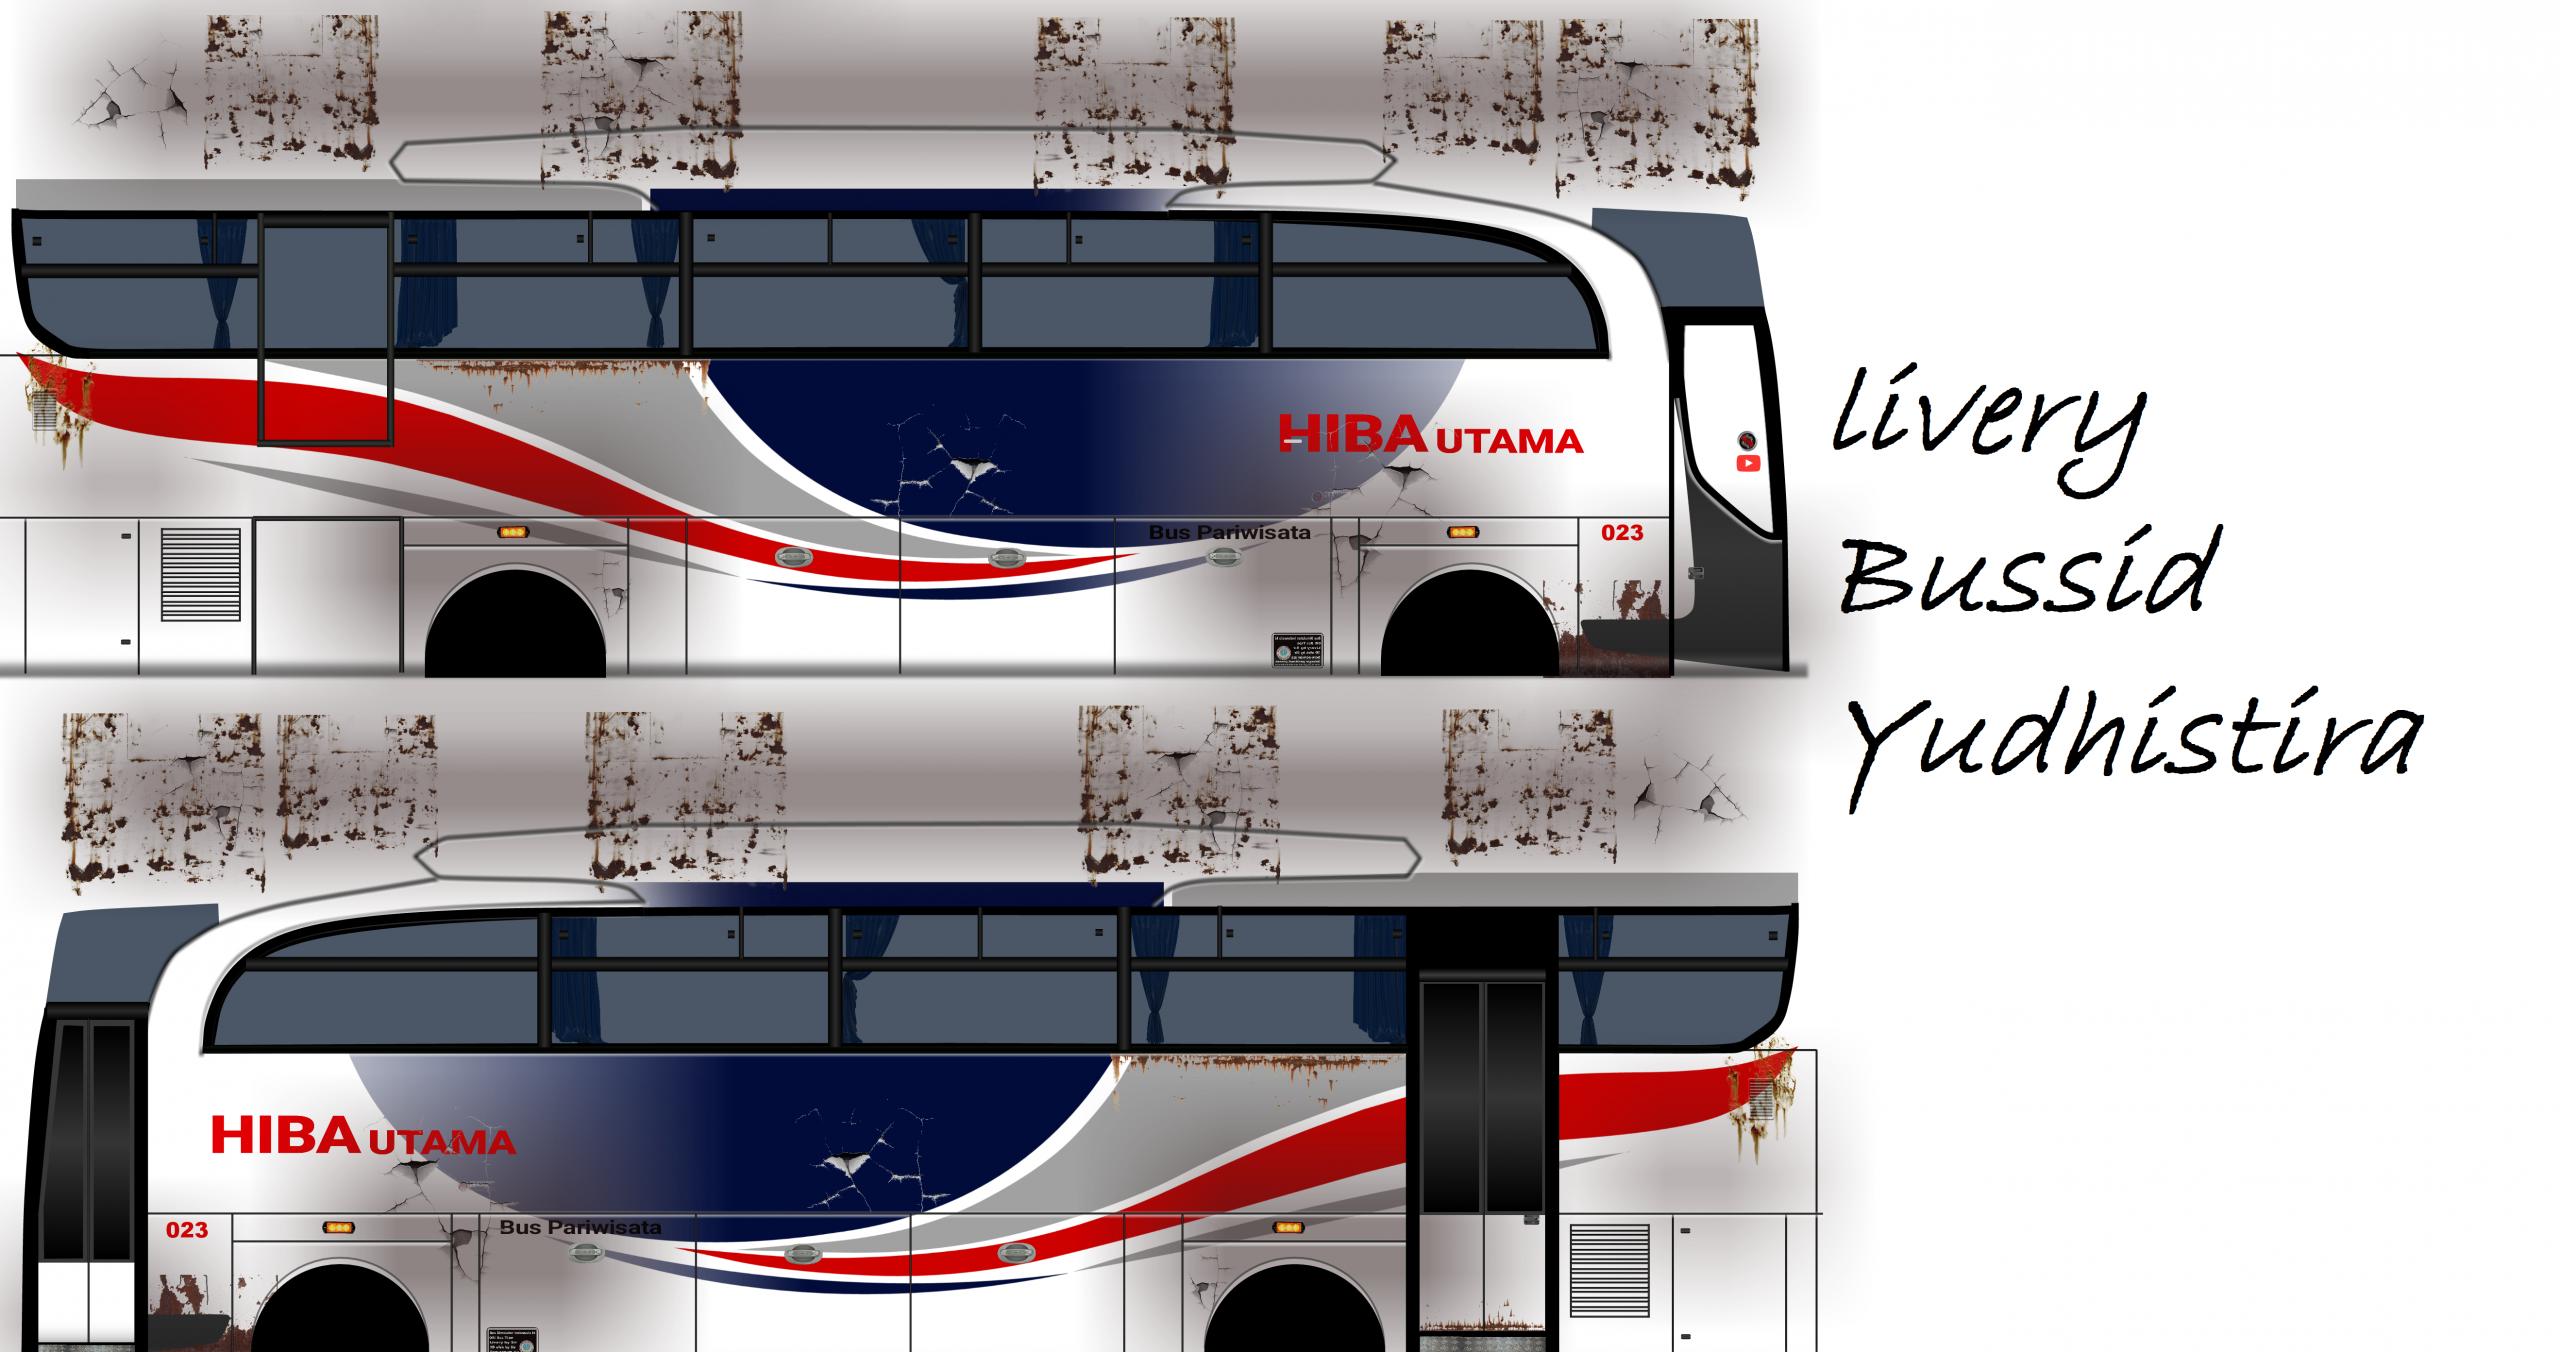 livery bussid yudistira hd download